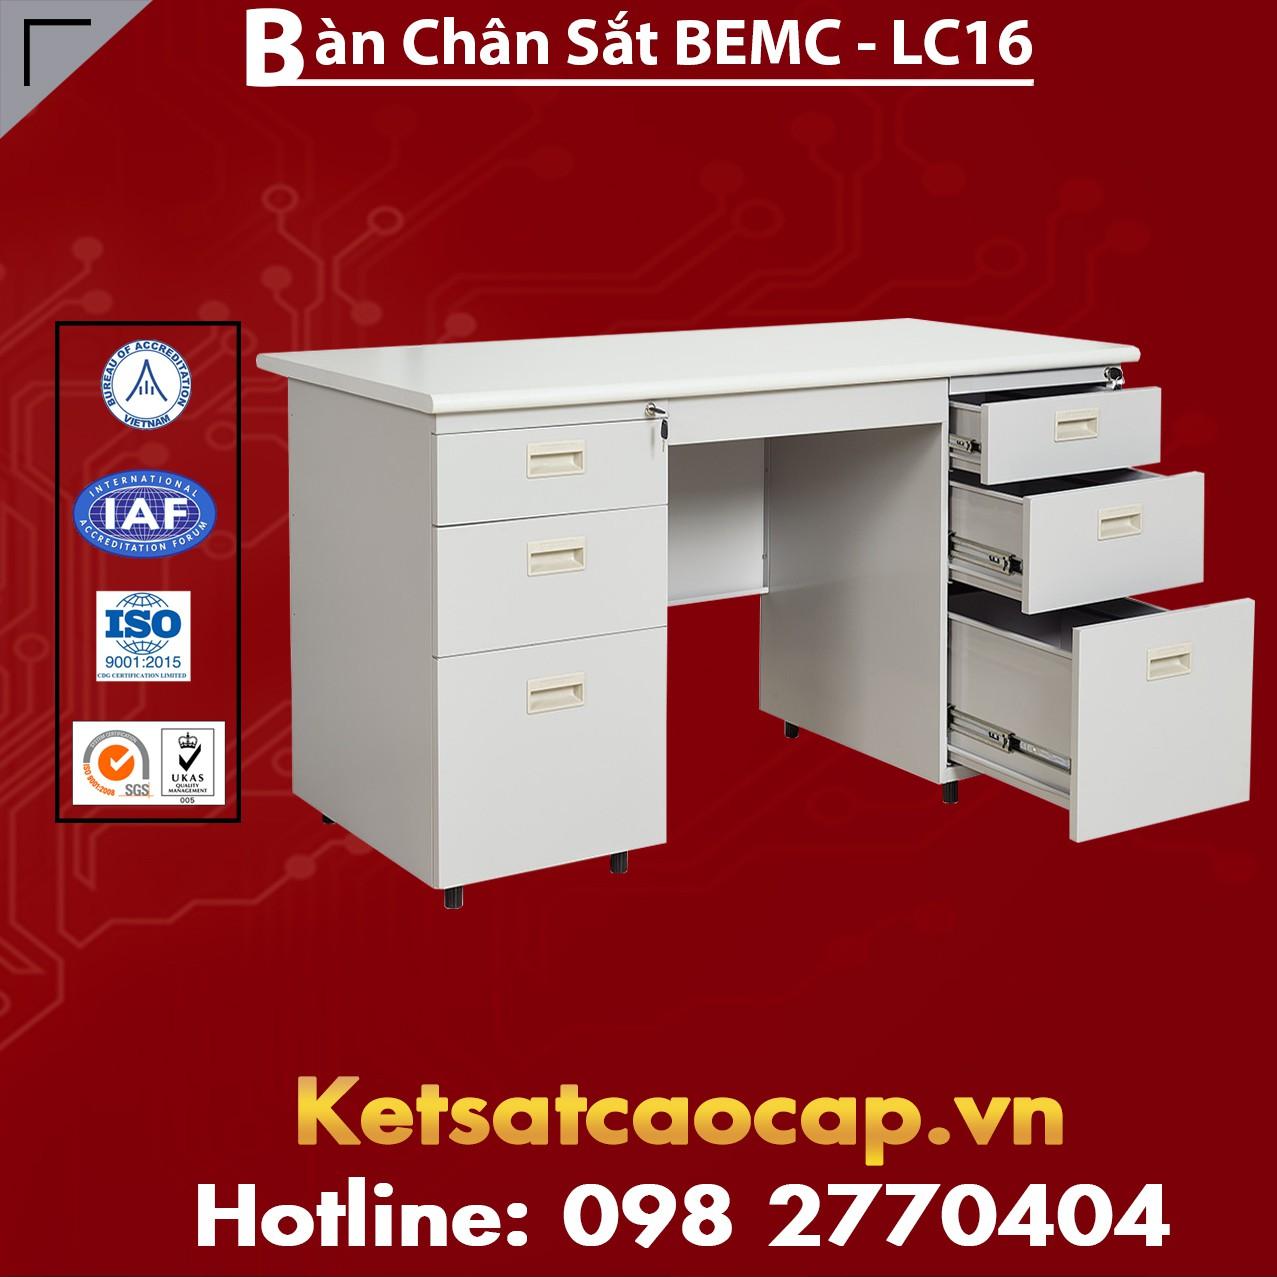 Bàn Chân Sắt BEMC - LC16